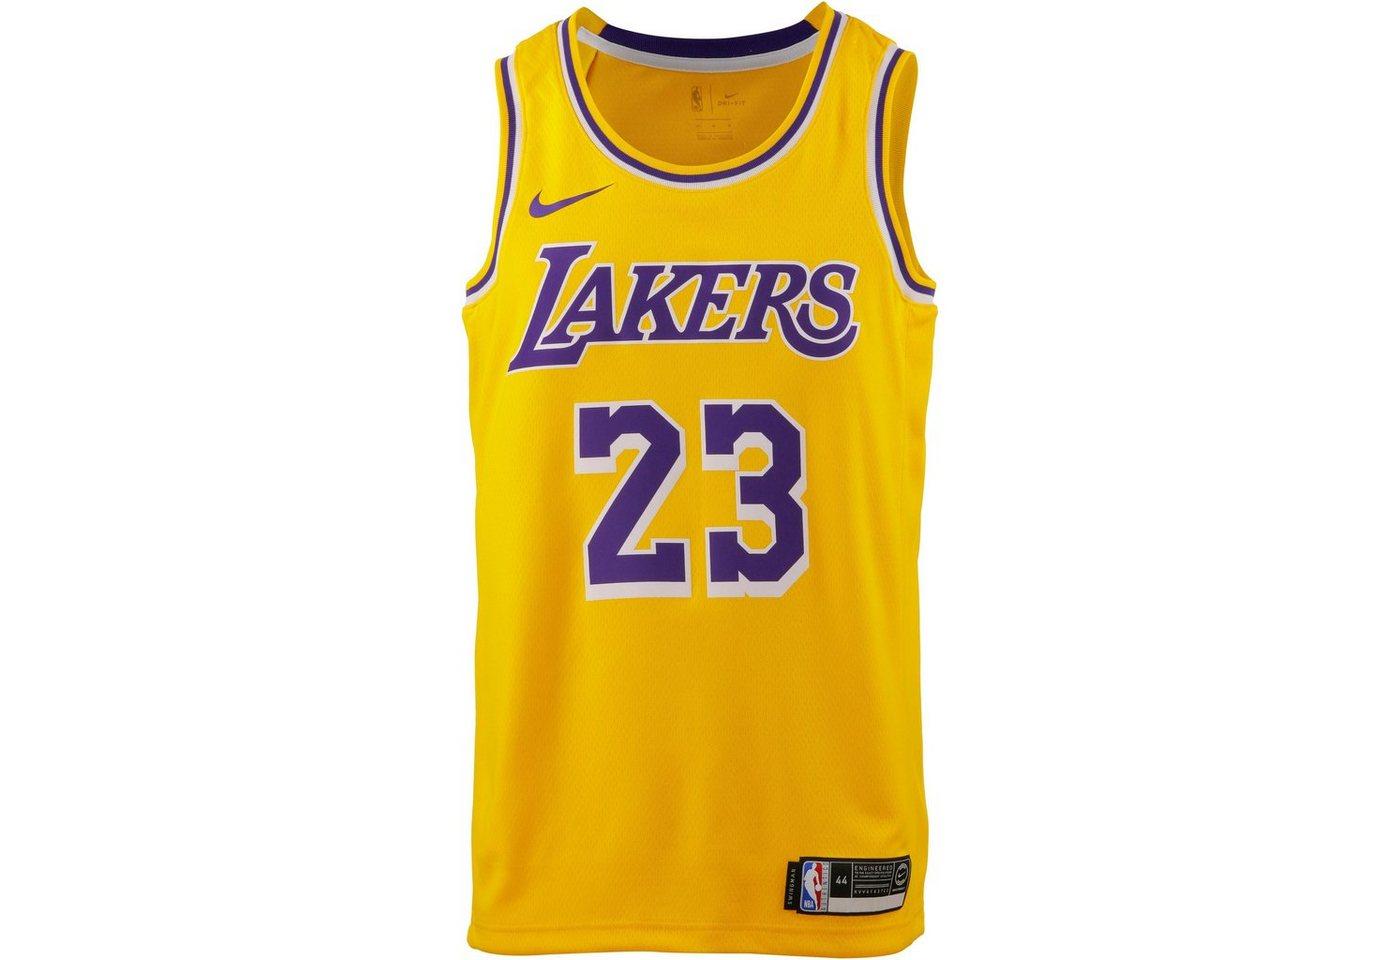 Nike Basketballtrikot »Lebron James Los Angeles Lakers« | Sportbekleidung > Trikots > Basketballtrikots | Gelb | Polyester | Nike